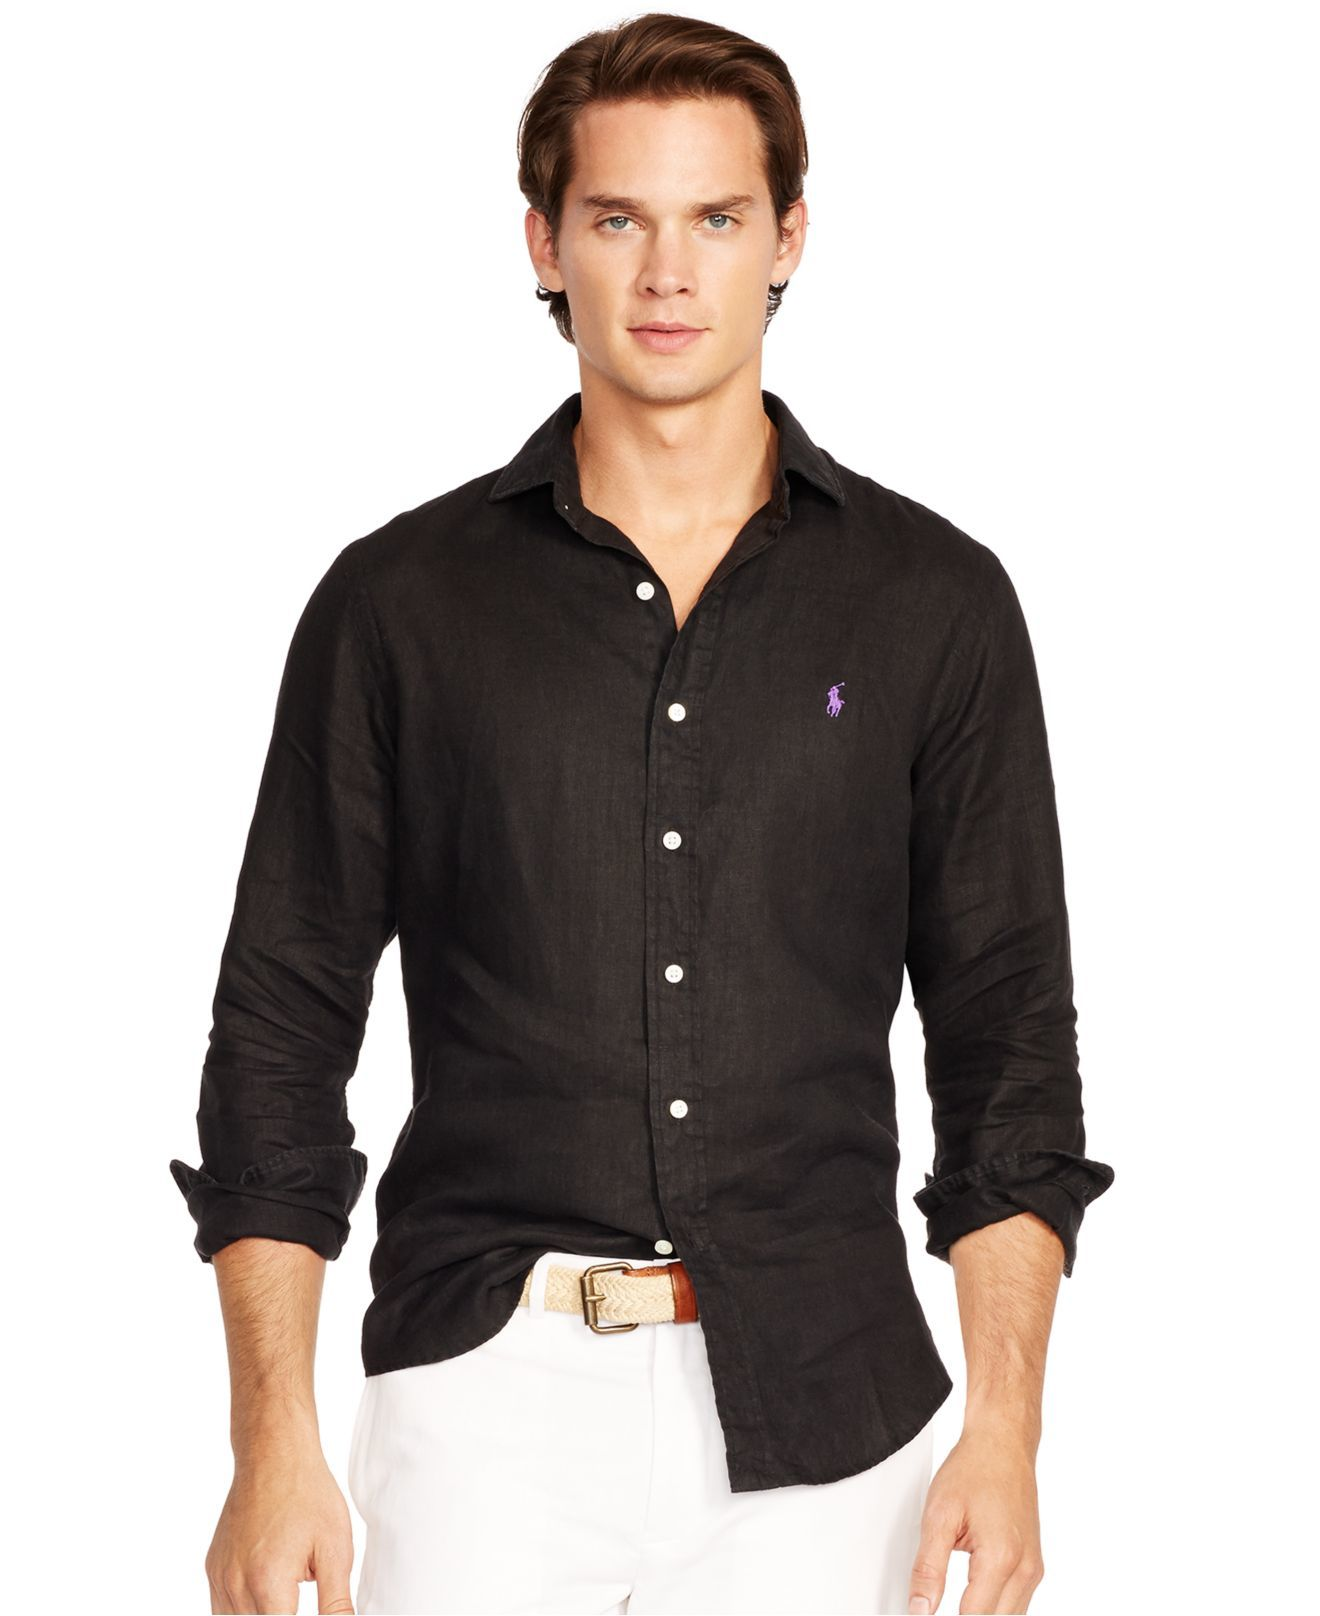 Alfani Big and Tall Lodi Striped Long Sleeve Shirt | MODELS MENS ...